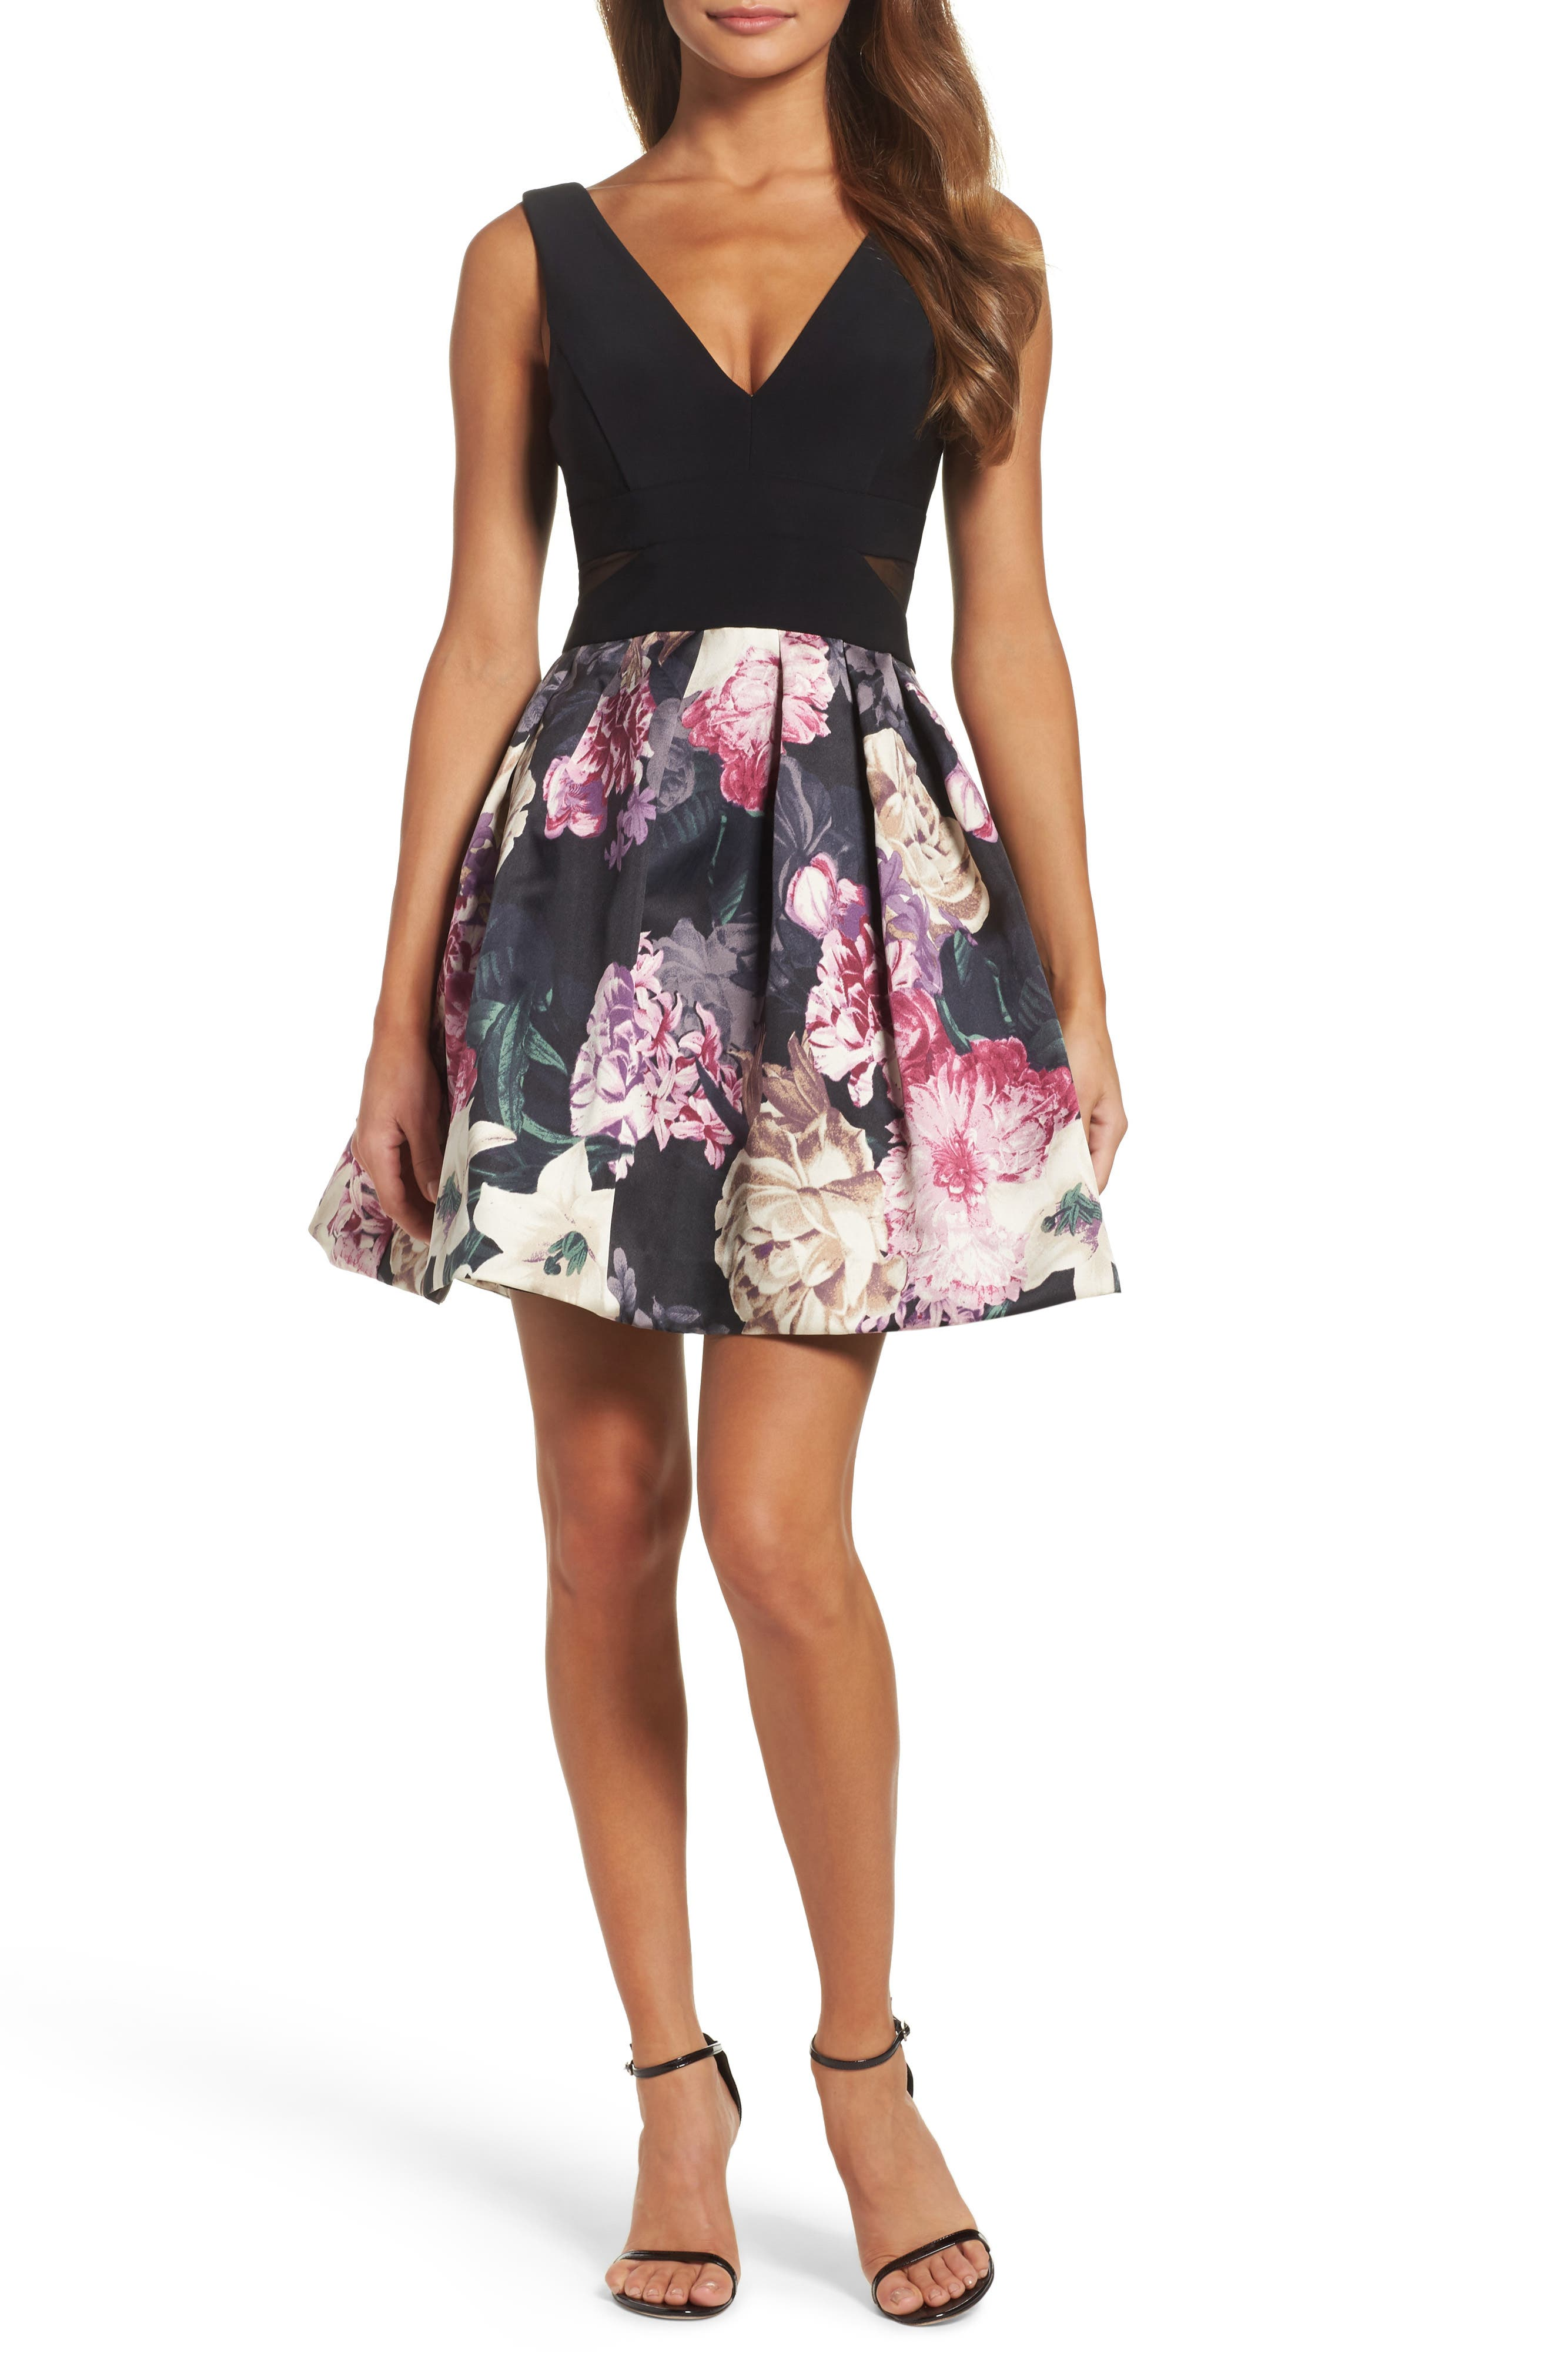 Xscape Mixed Media Party Dress